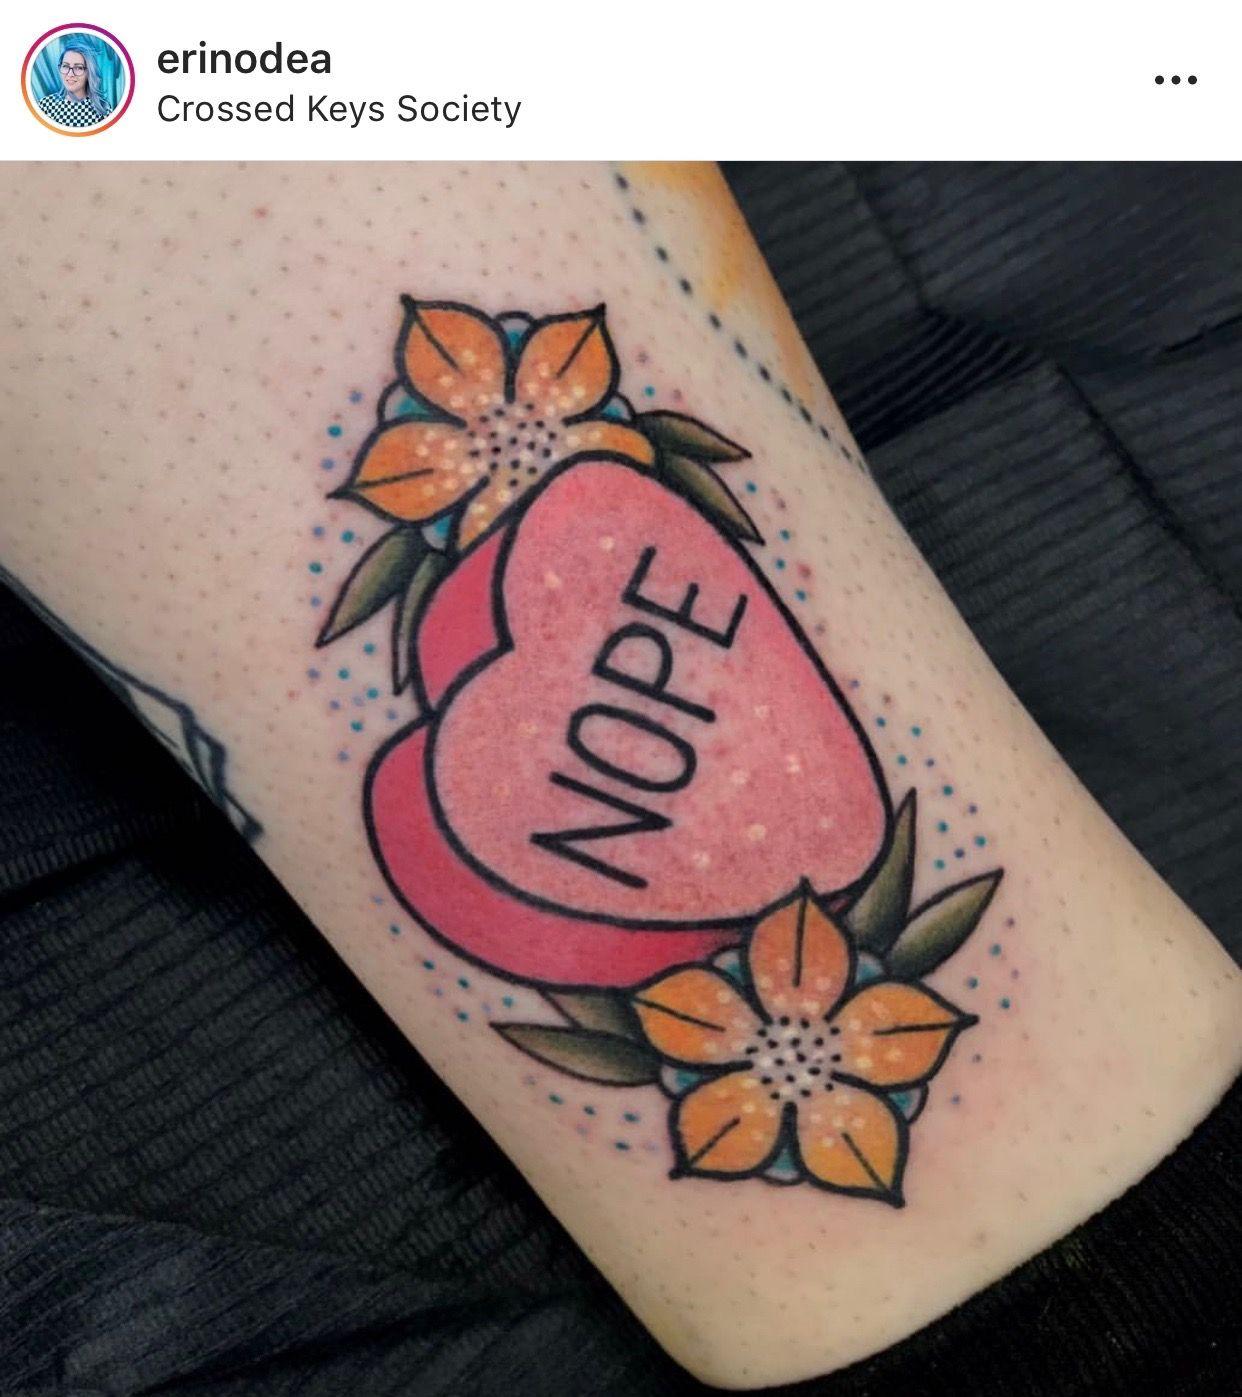 12+ Astonishing Candy heart tattoo designs ideas